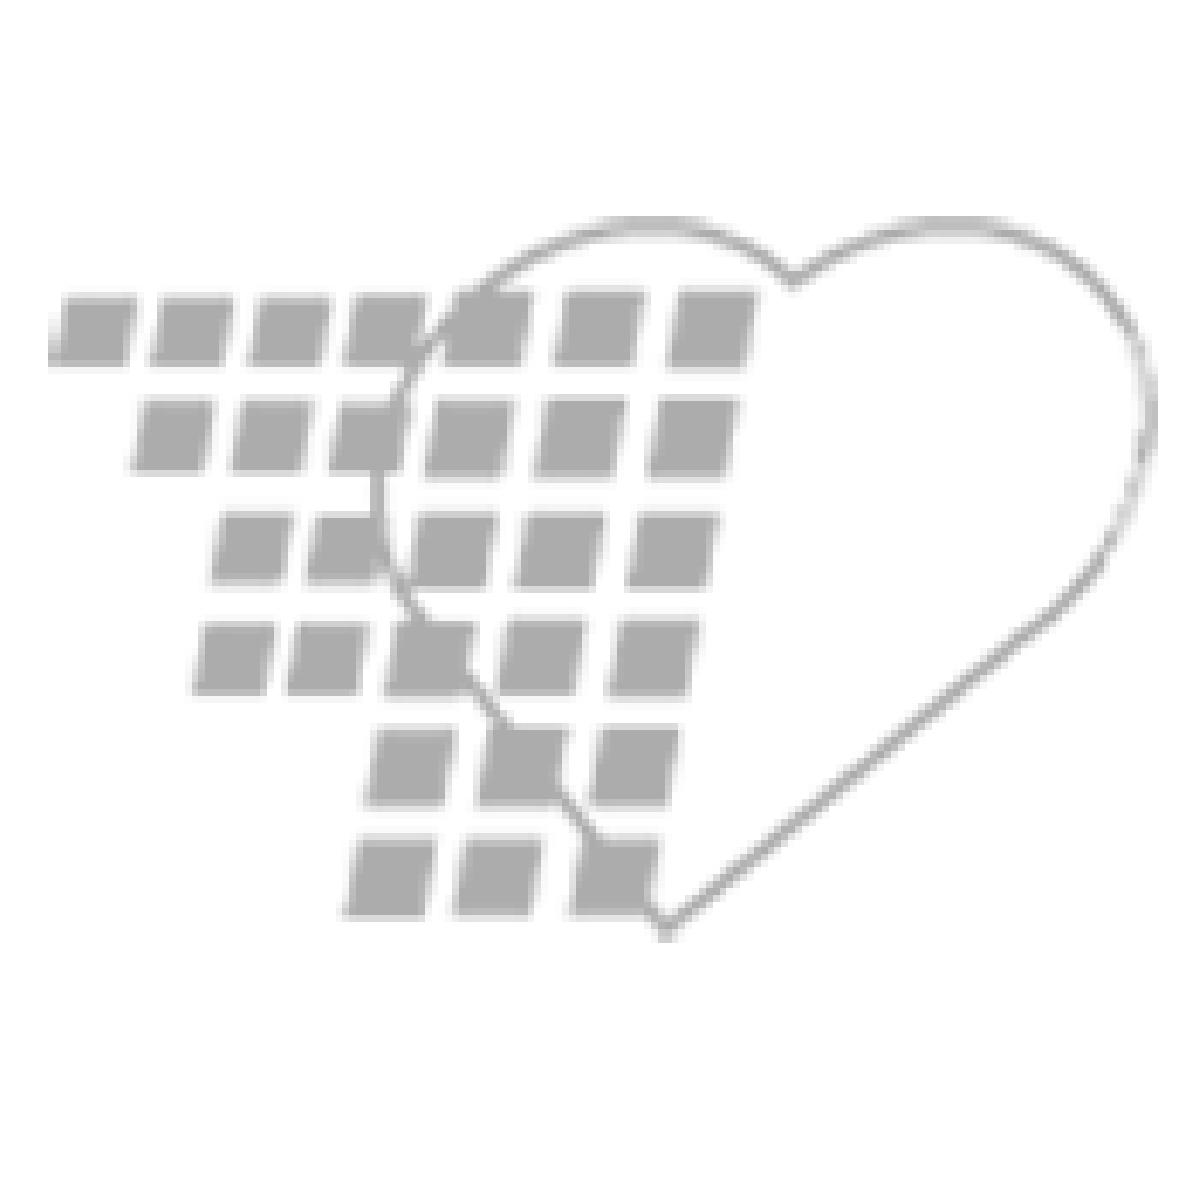 04-54-2101 Pocket Nurse® Bed Socket Telescoping IV Pole